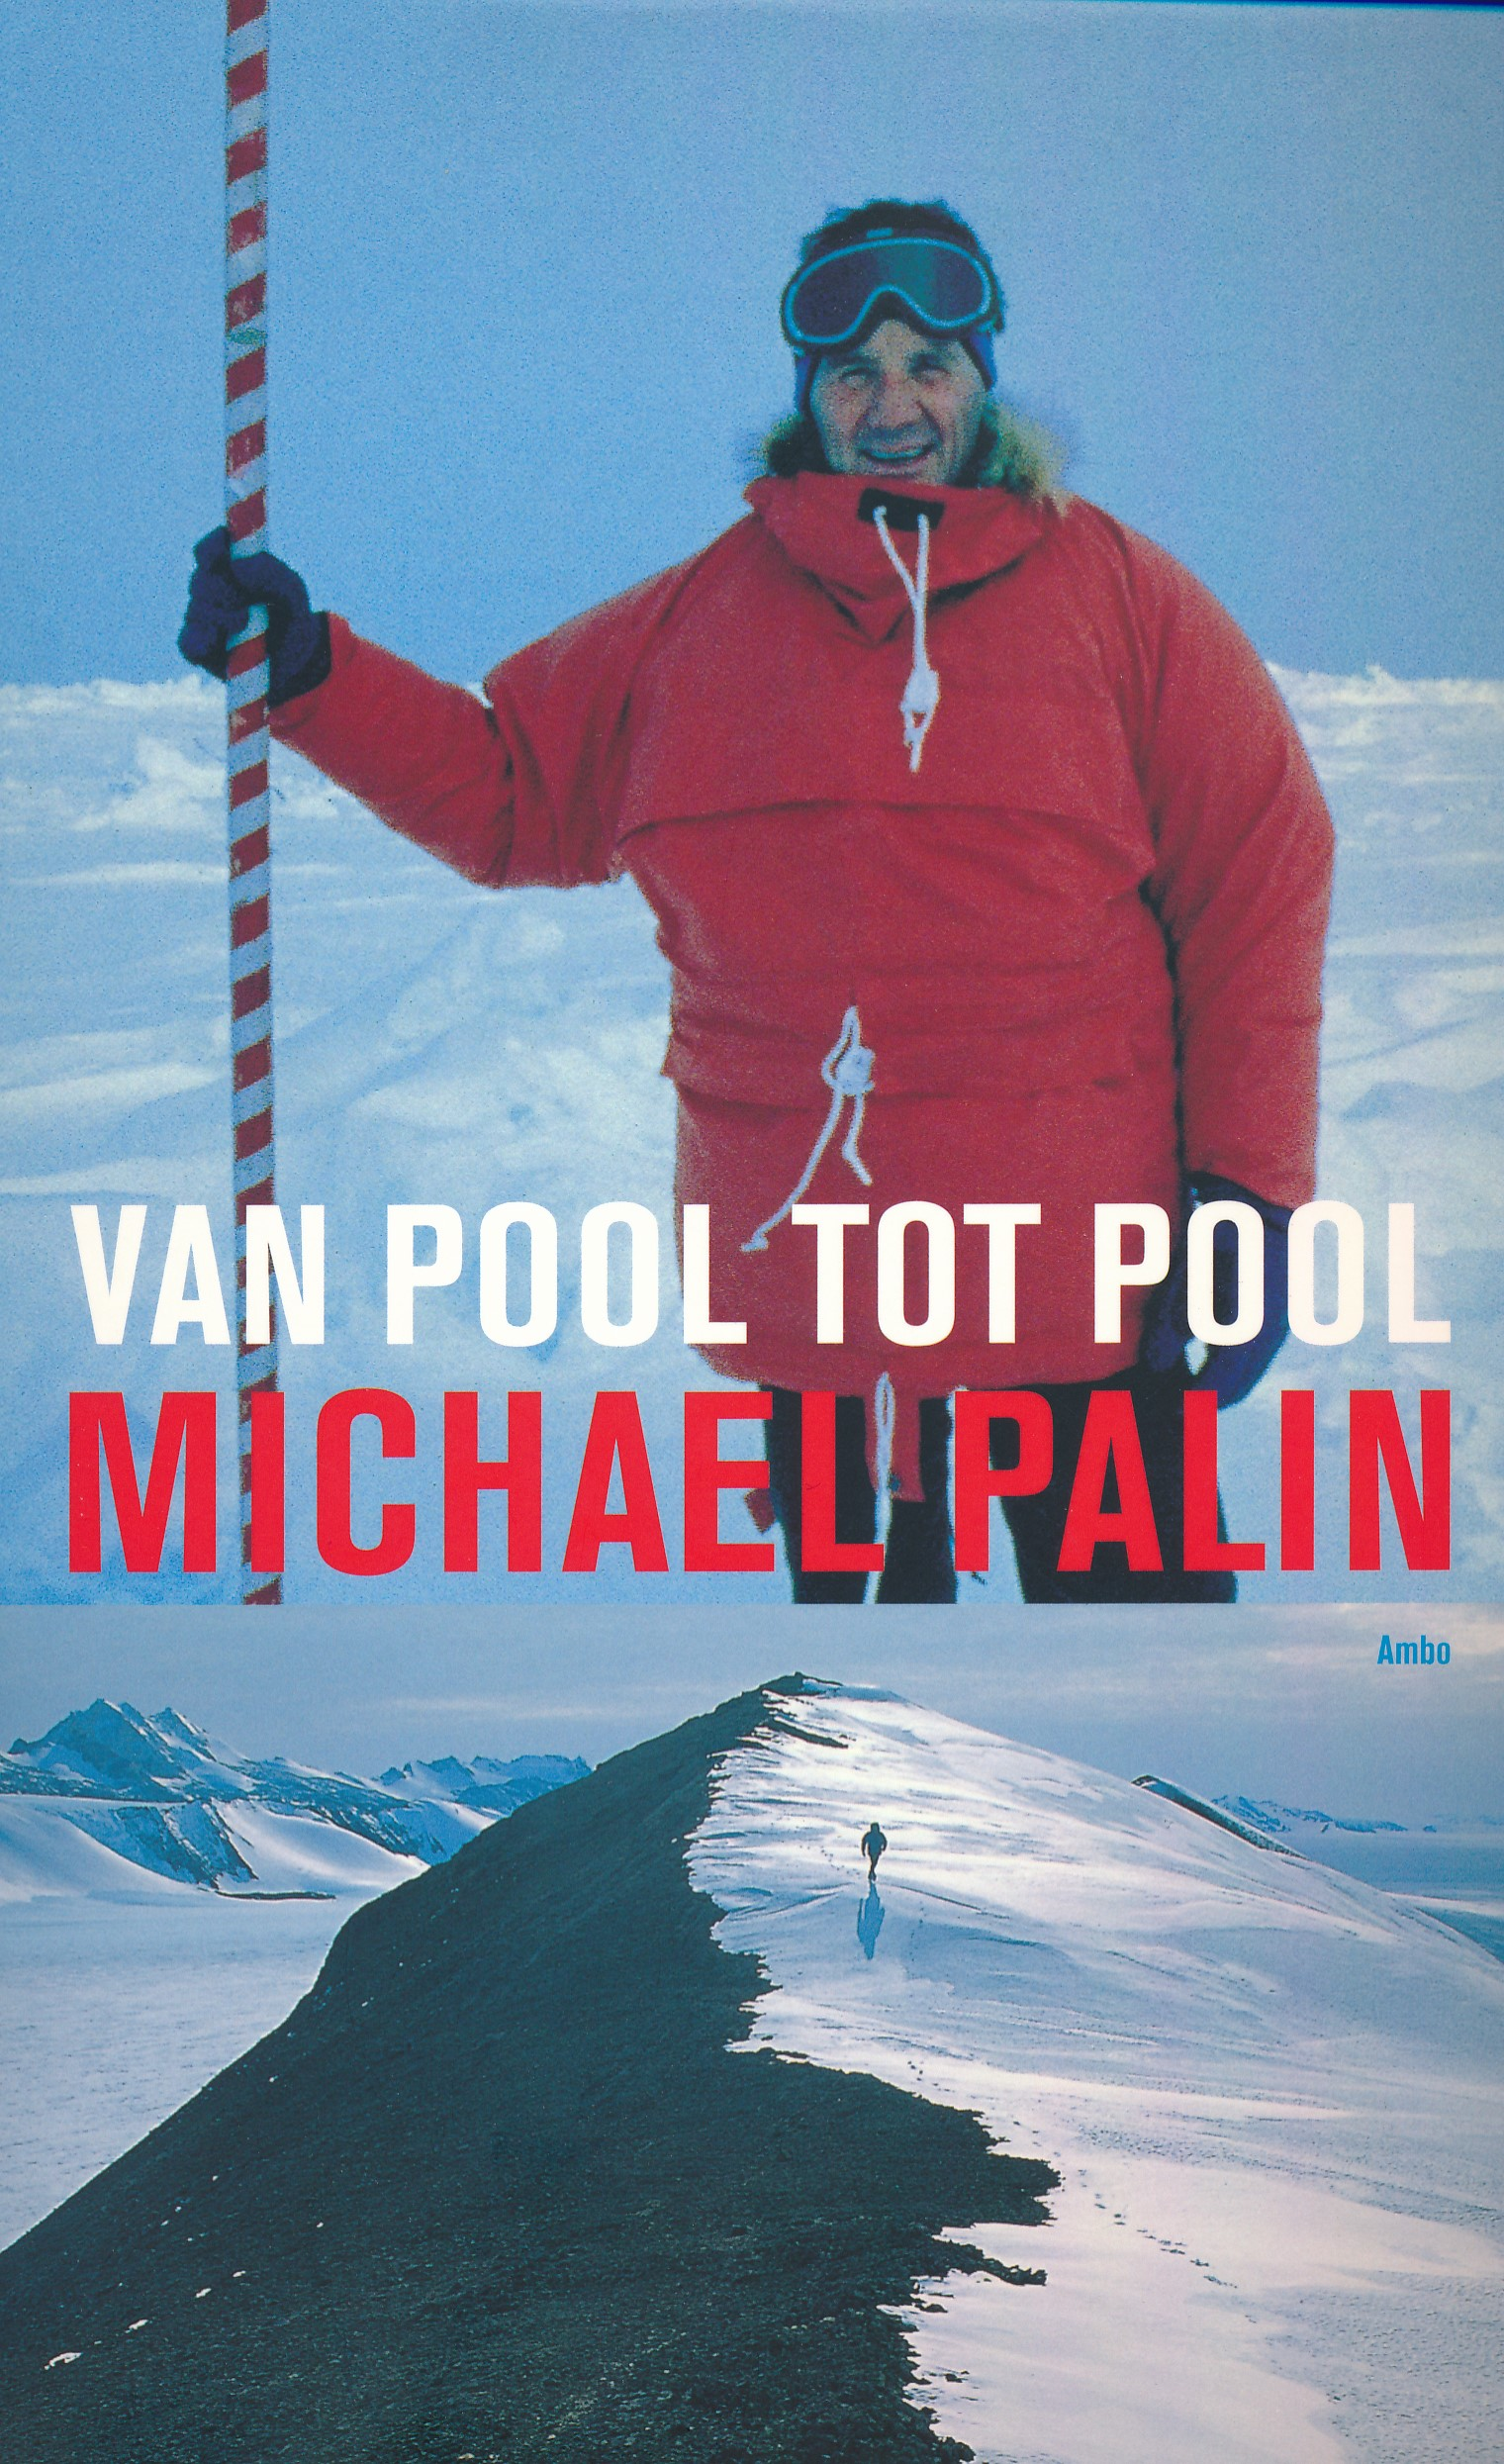 Opruiming - Reisverhaal van Pool tot Pool | Michael Palin <br/>€ 8.90 <br/> <a href='https://www.dezwerver.nl/reisgidsen/?tt=1554_252853_241358_&r=https%3A%2F%2Fwww.dezwerver.nl%2Fc%2Fboeken%2Freisverhalen%2F9789026322600%2Fopruiming-reisverhaal-van-pool-tot-pool-michael-palin%2F' target='_blank'>Meer Info</a>